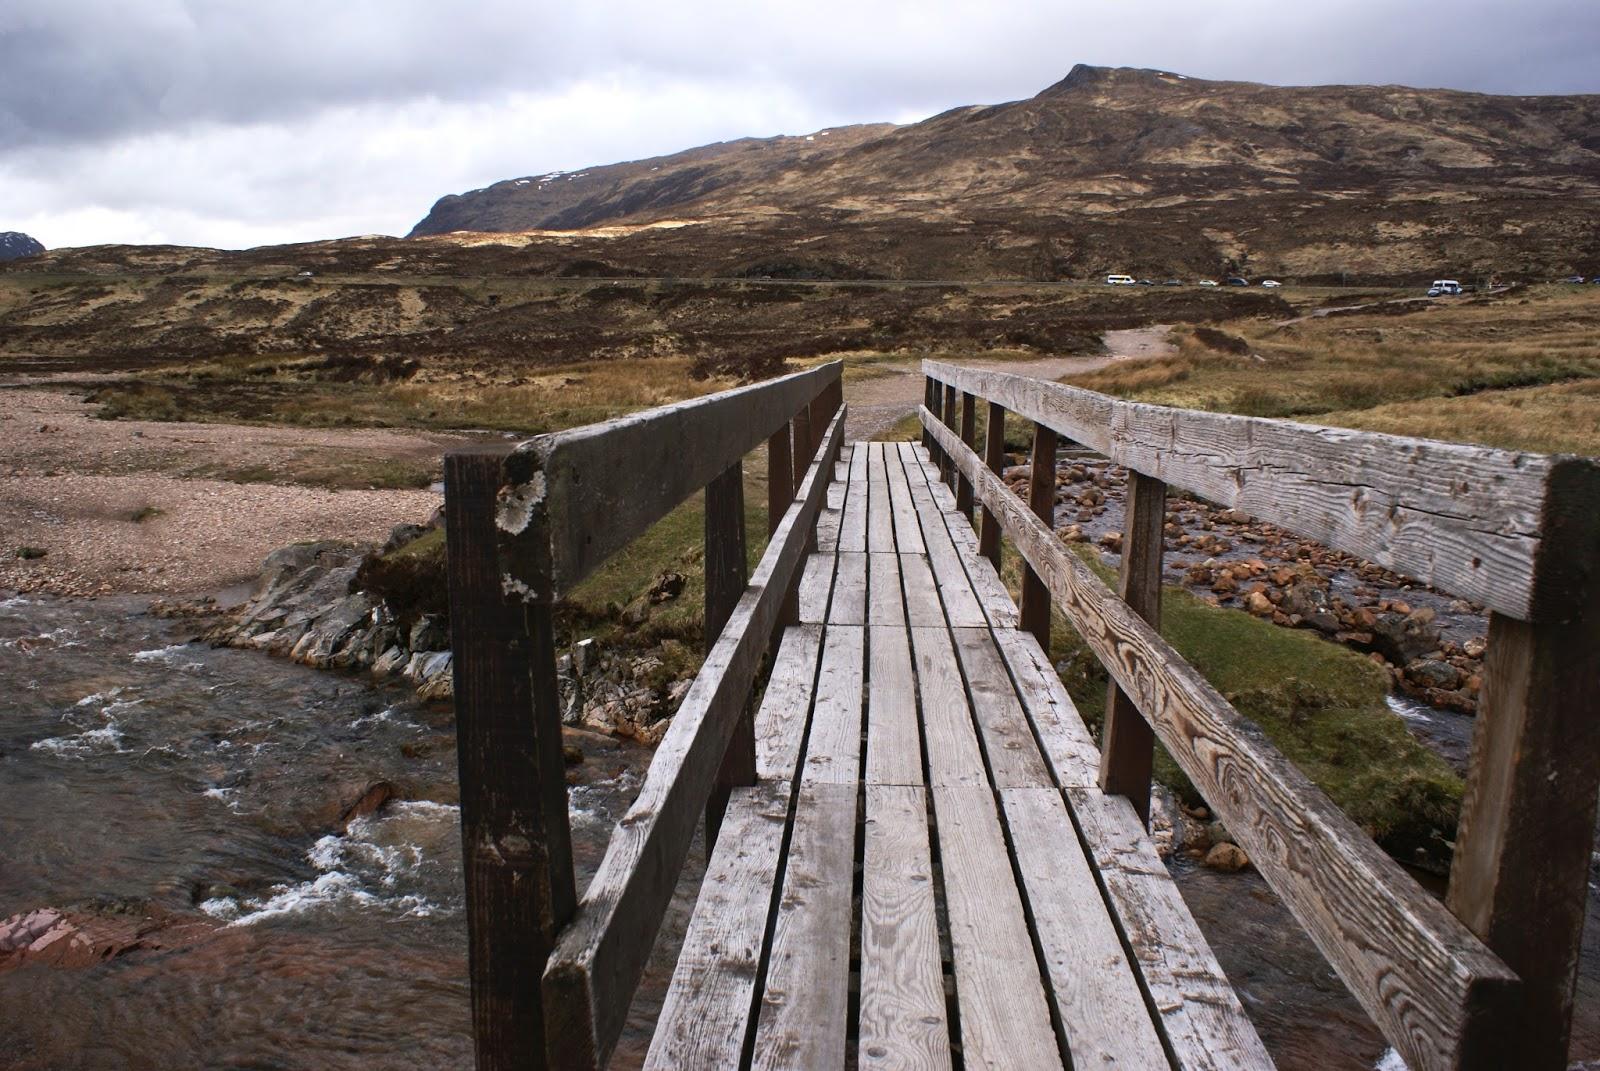 glen coe highlands bridge Altnafeadh scotland united kingdom uk